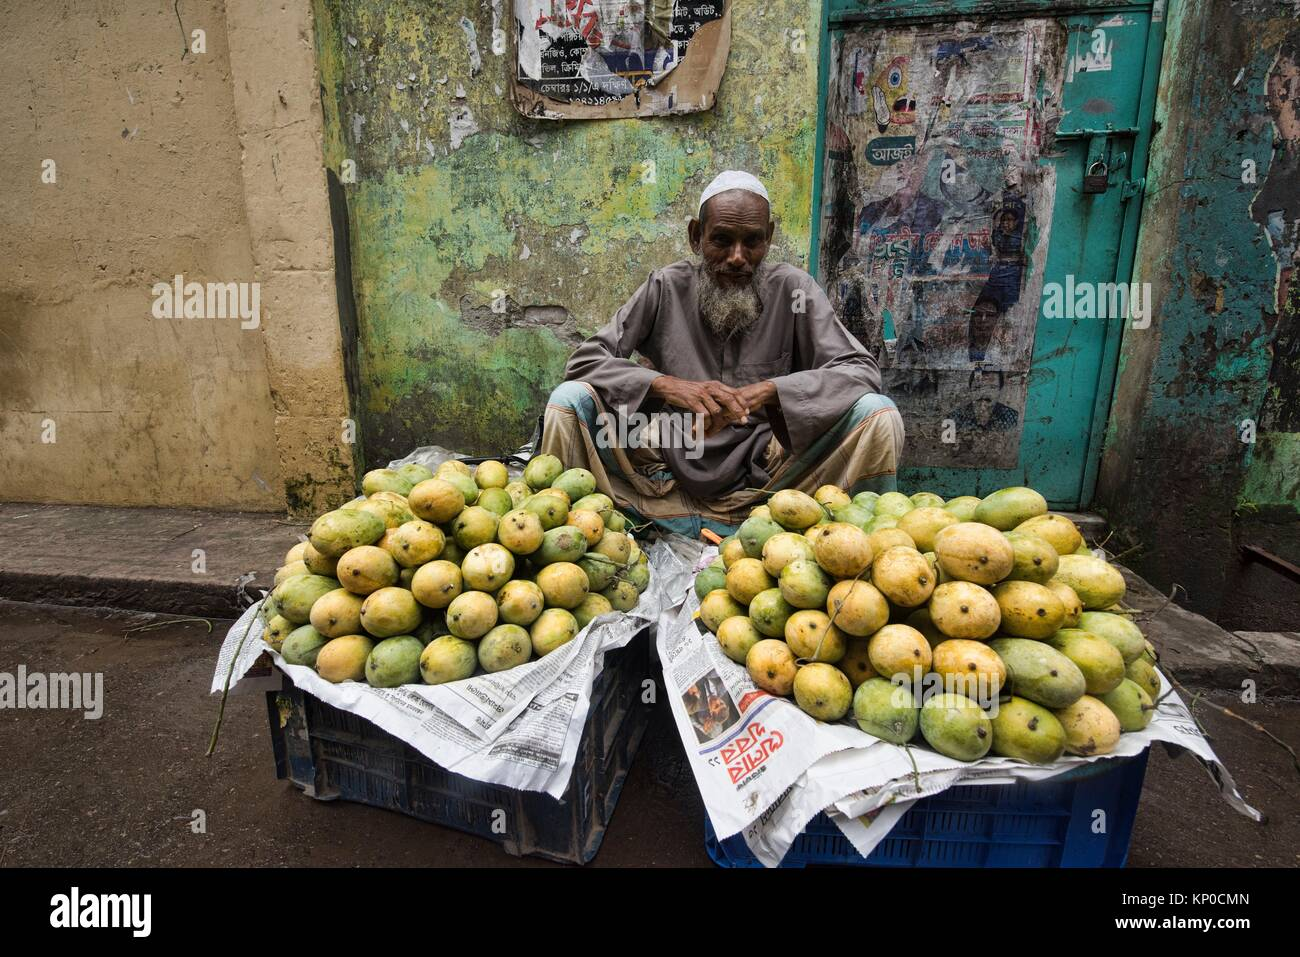 Mango seller, Dhaka, Bangladesh. - Stock Image